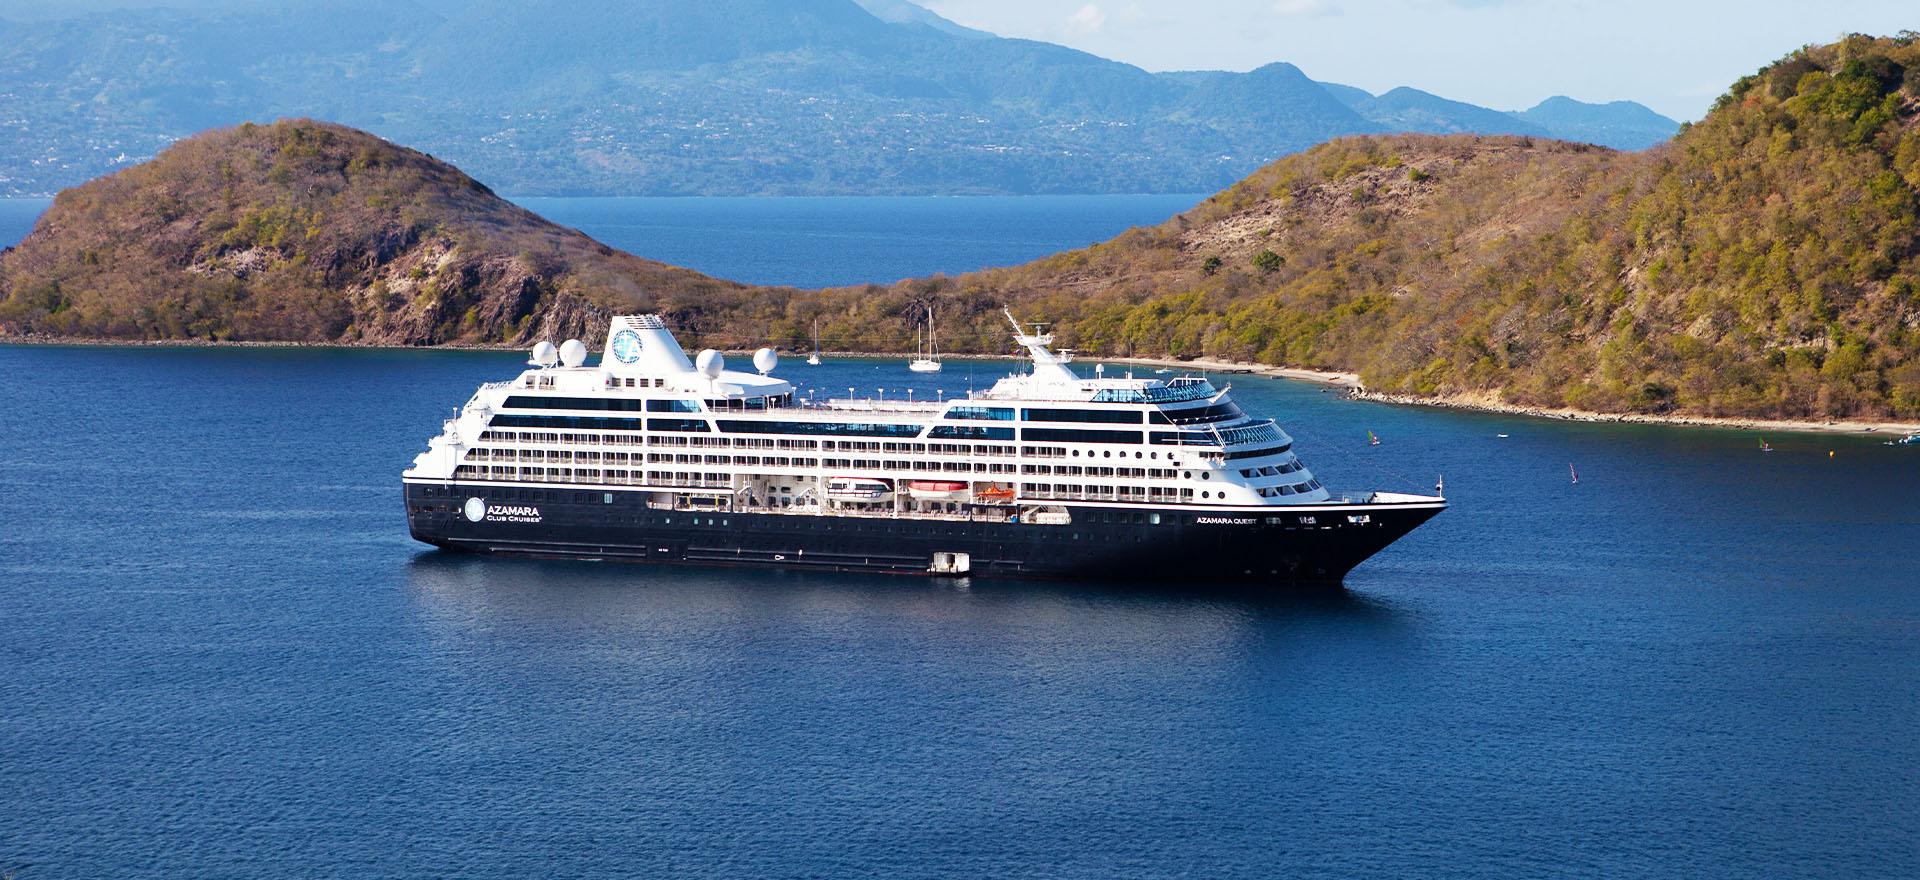 Azamara Quest ship, sailing on open waters